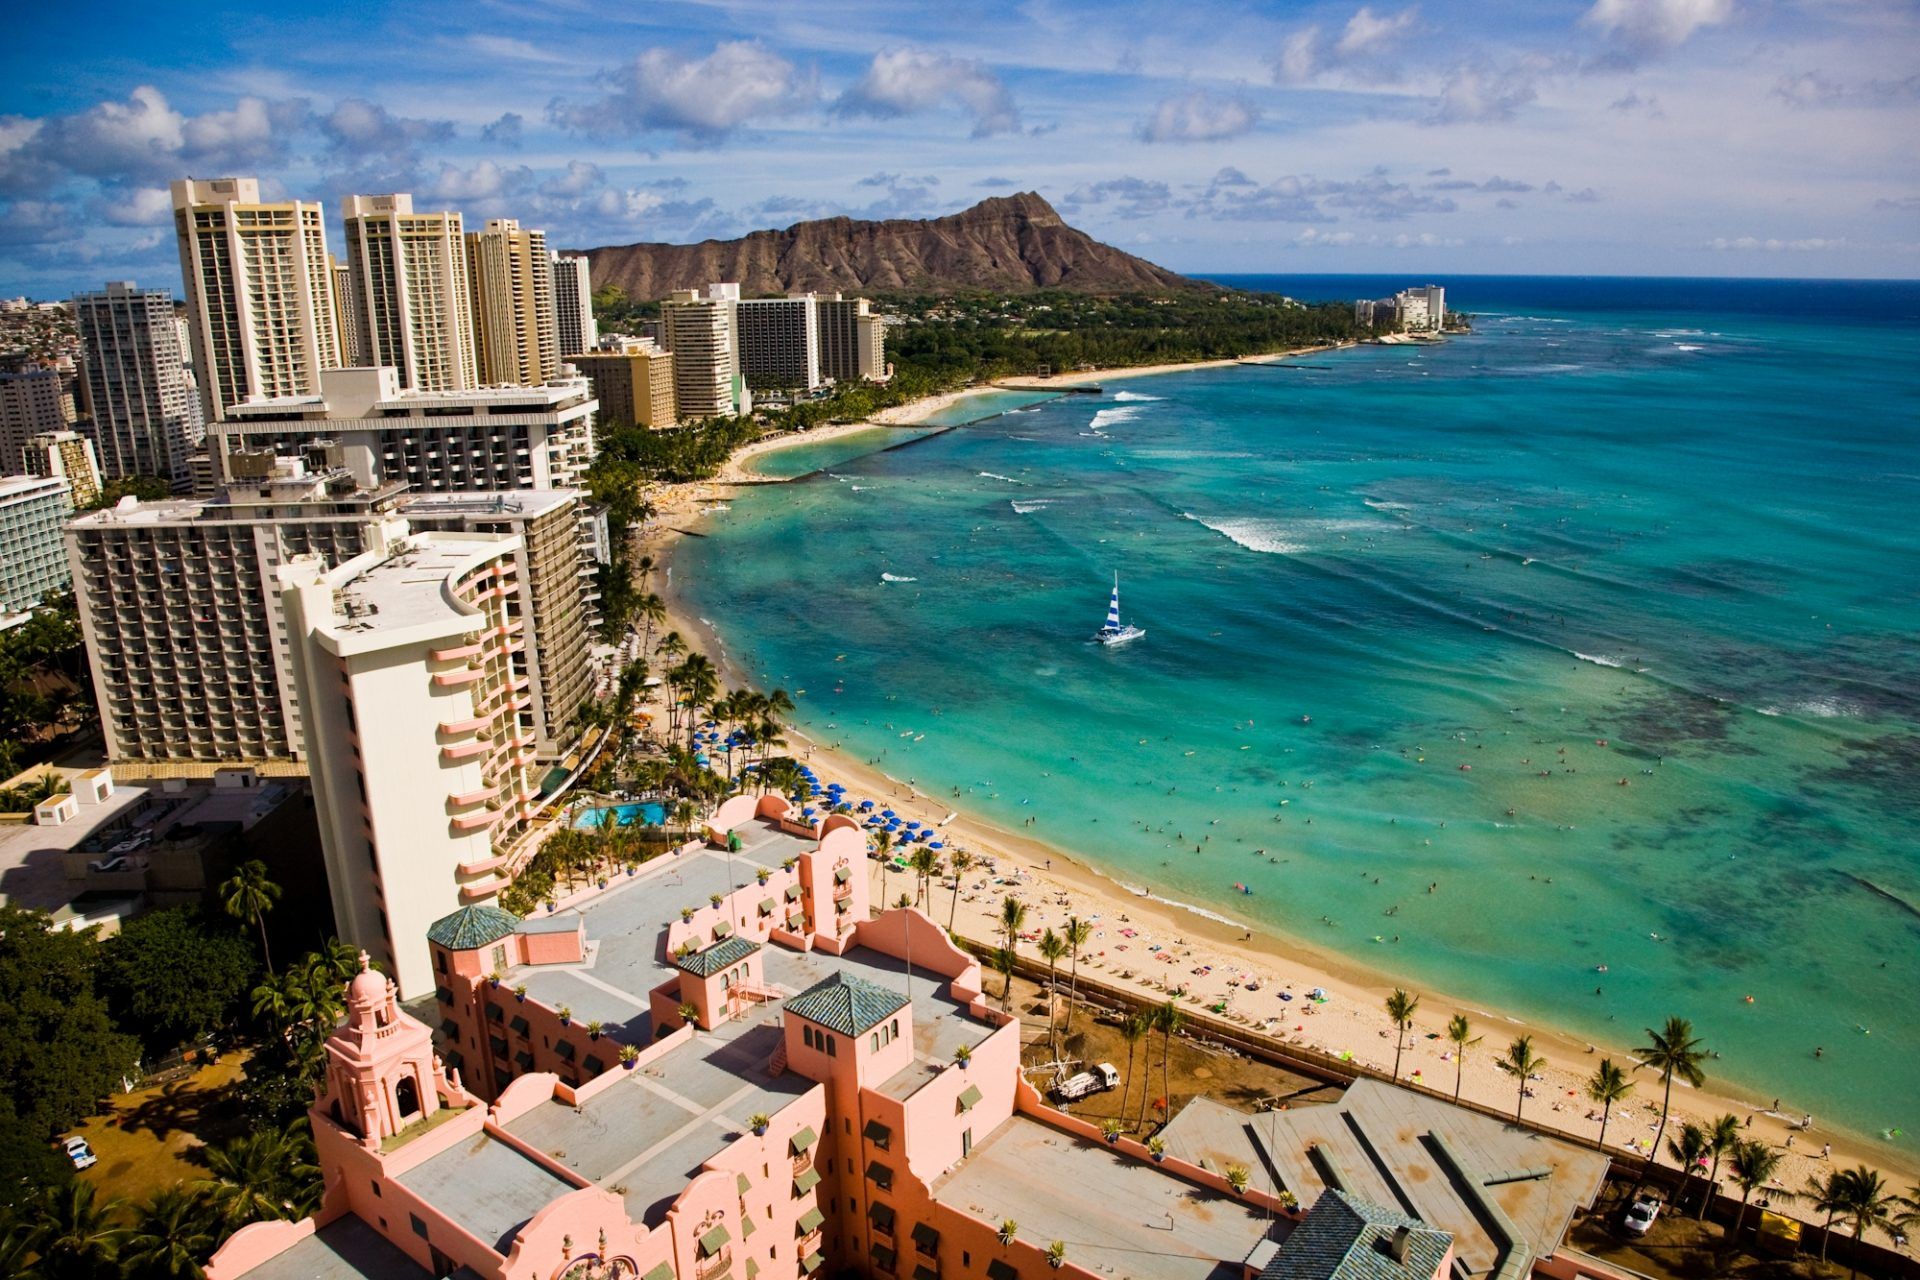 Hawaii Tourism Authority (HTA) / Dana Edmunds